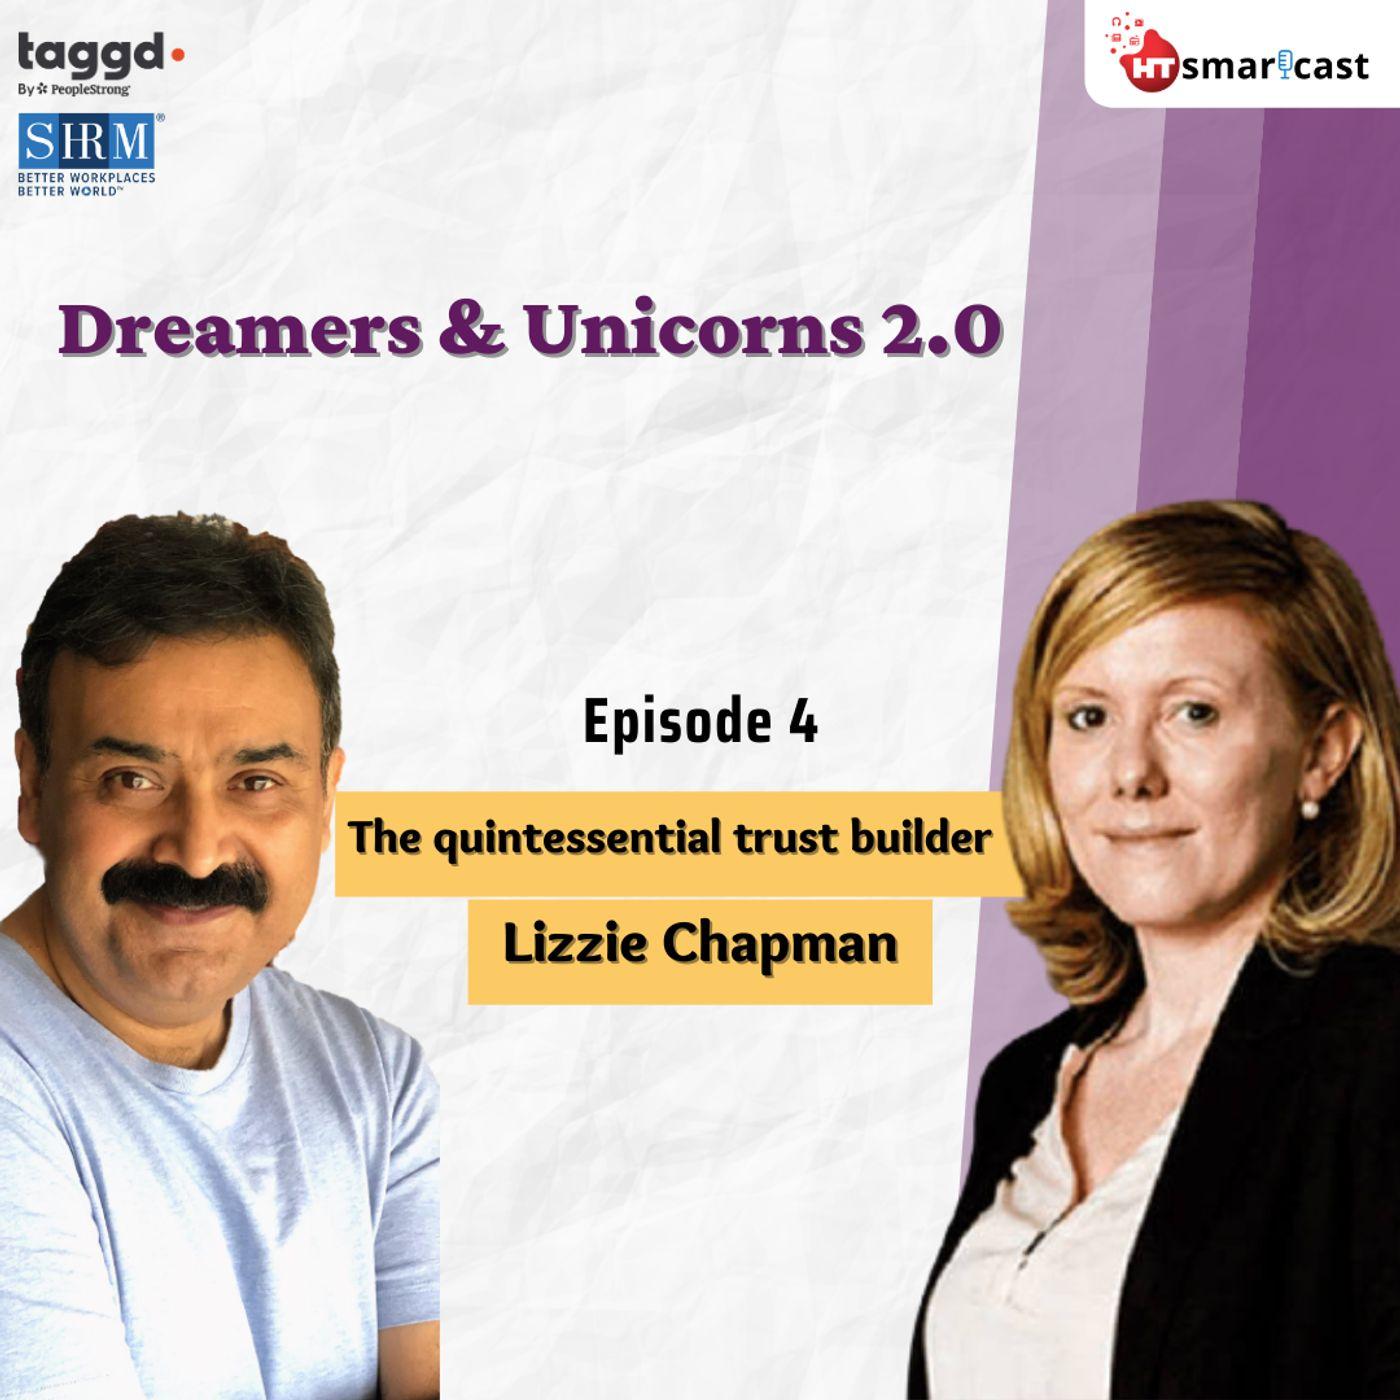 5: The quintessential trust builder - Lizzie Chapman